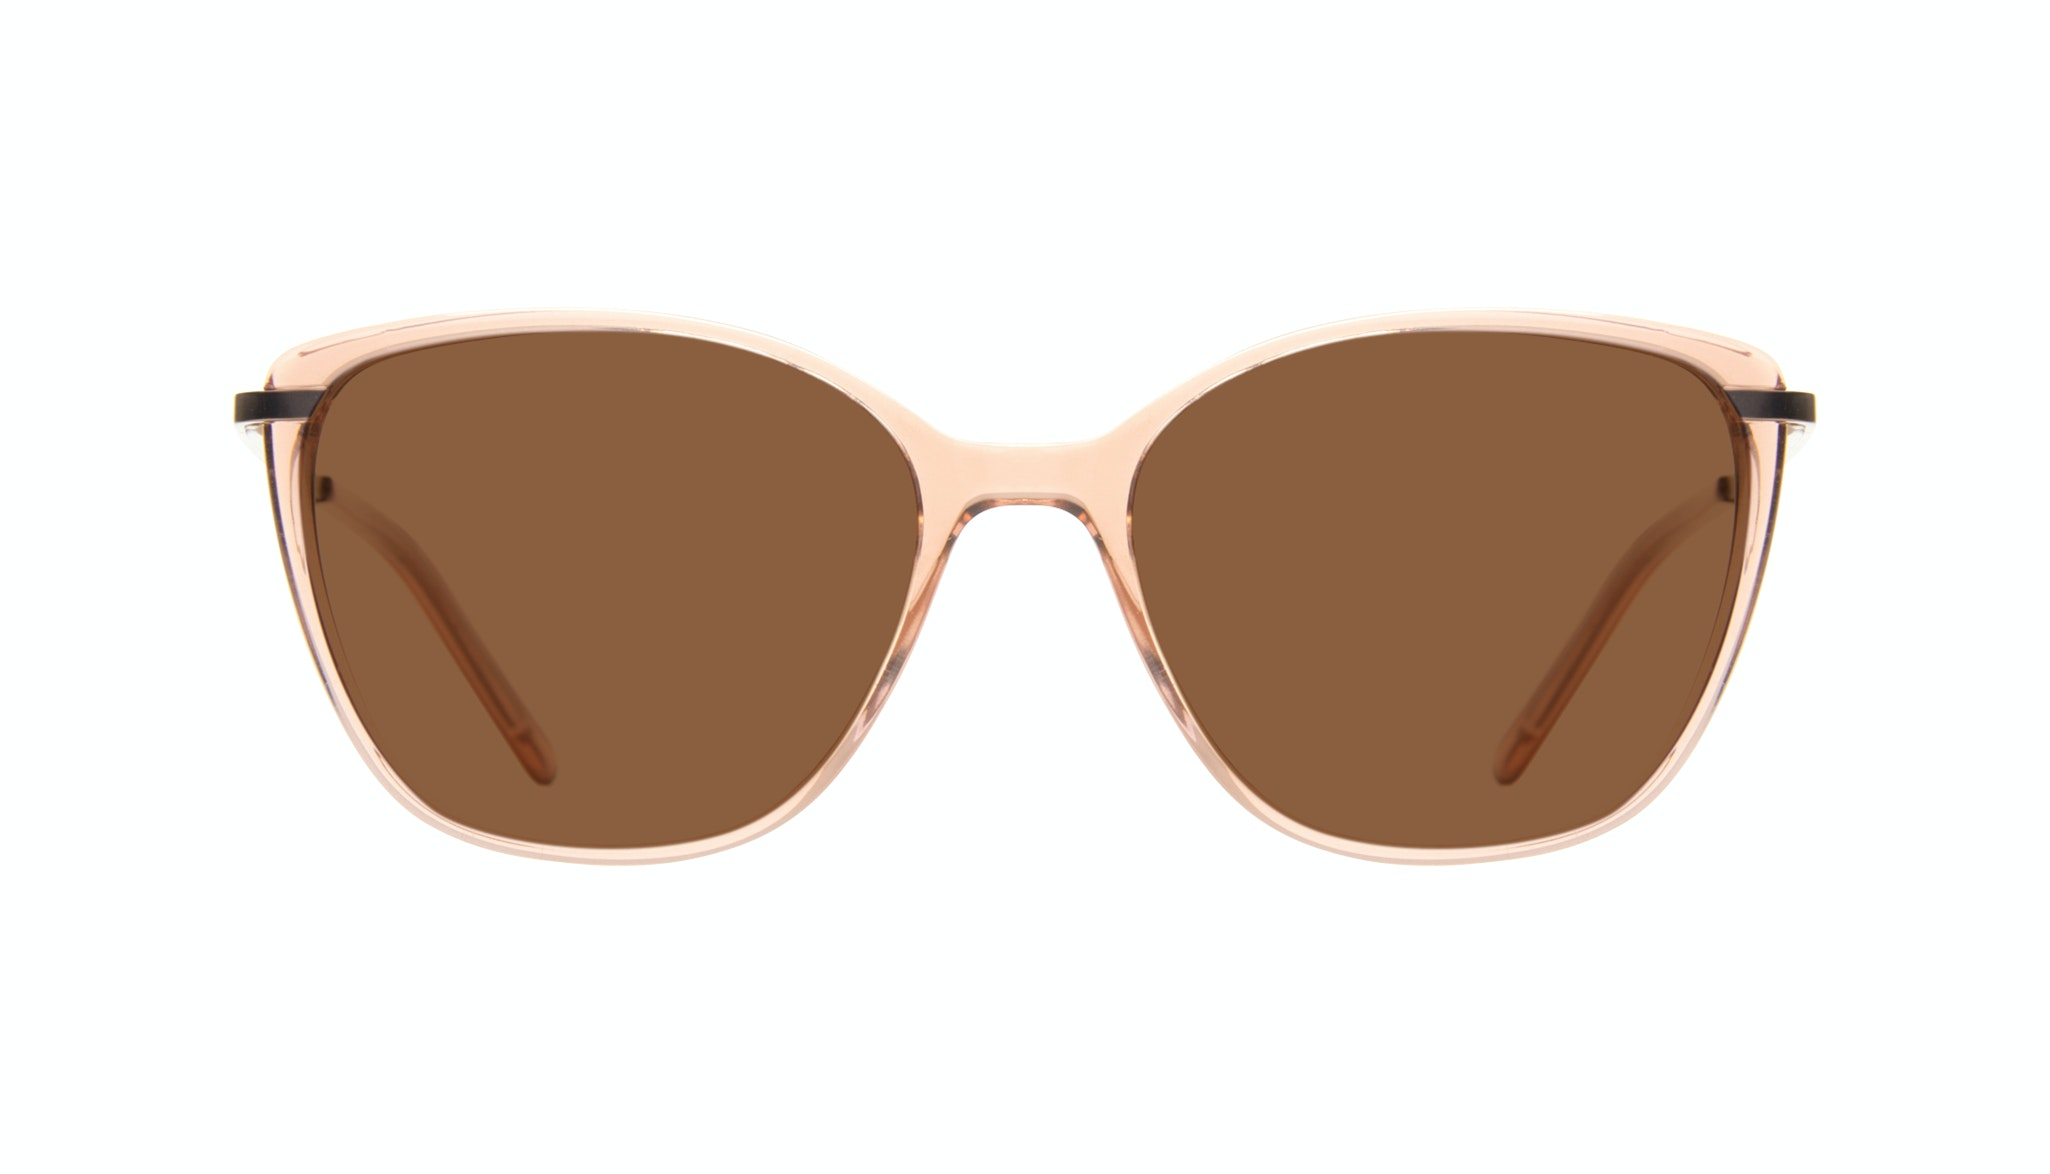 Affordable Fashion Glasses Cat Eye Rectangle Square Sunglasses Women Illusion Rose Front